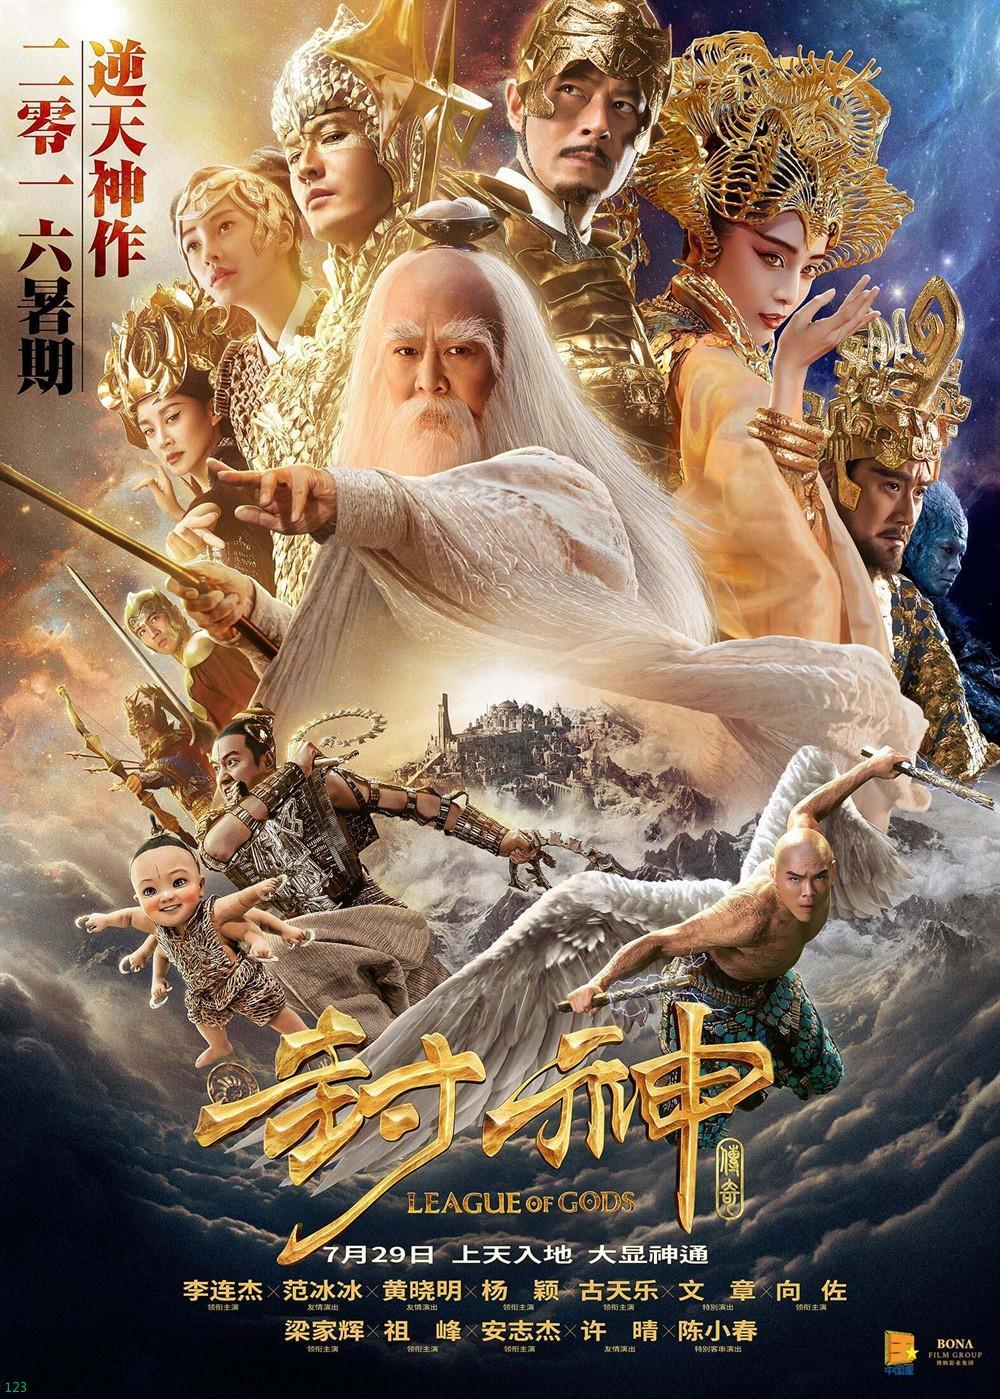 9333 - League of Gods - Phong Thần Truyền Kỳ